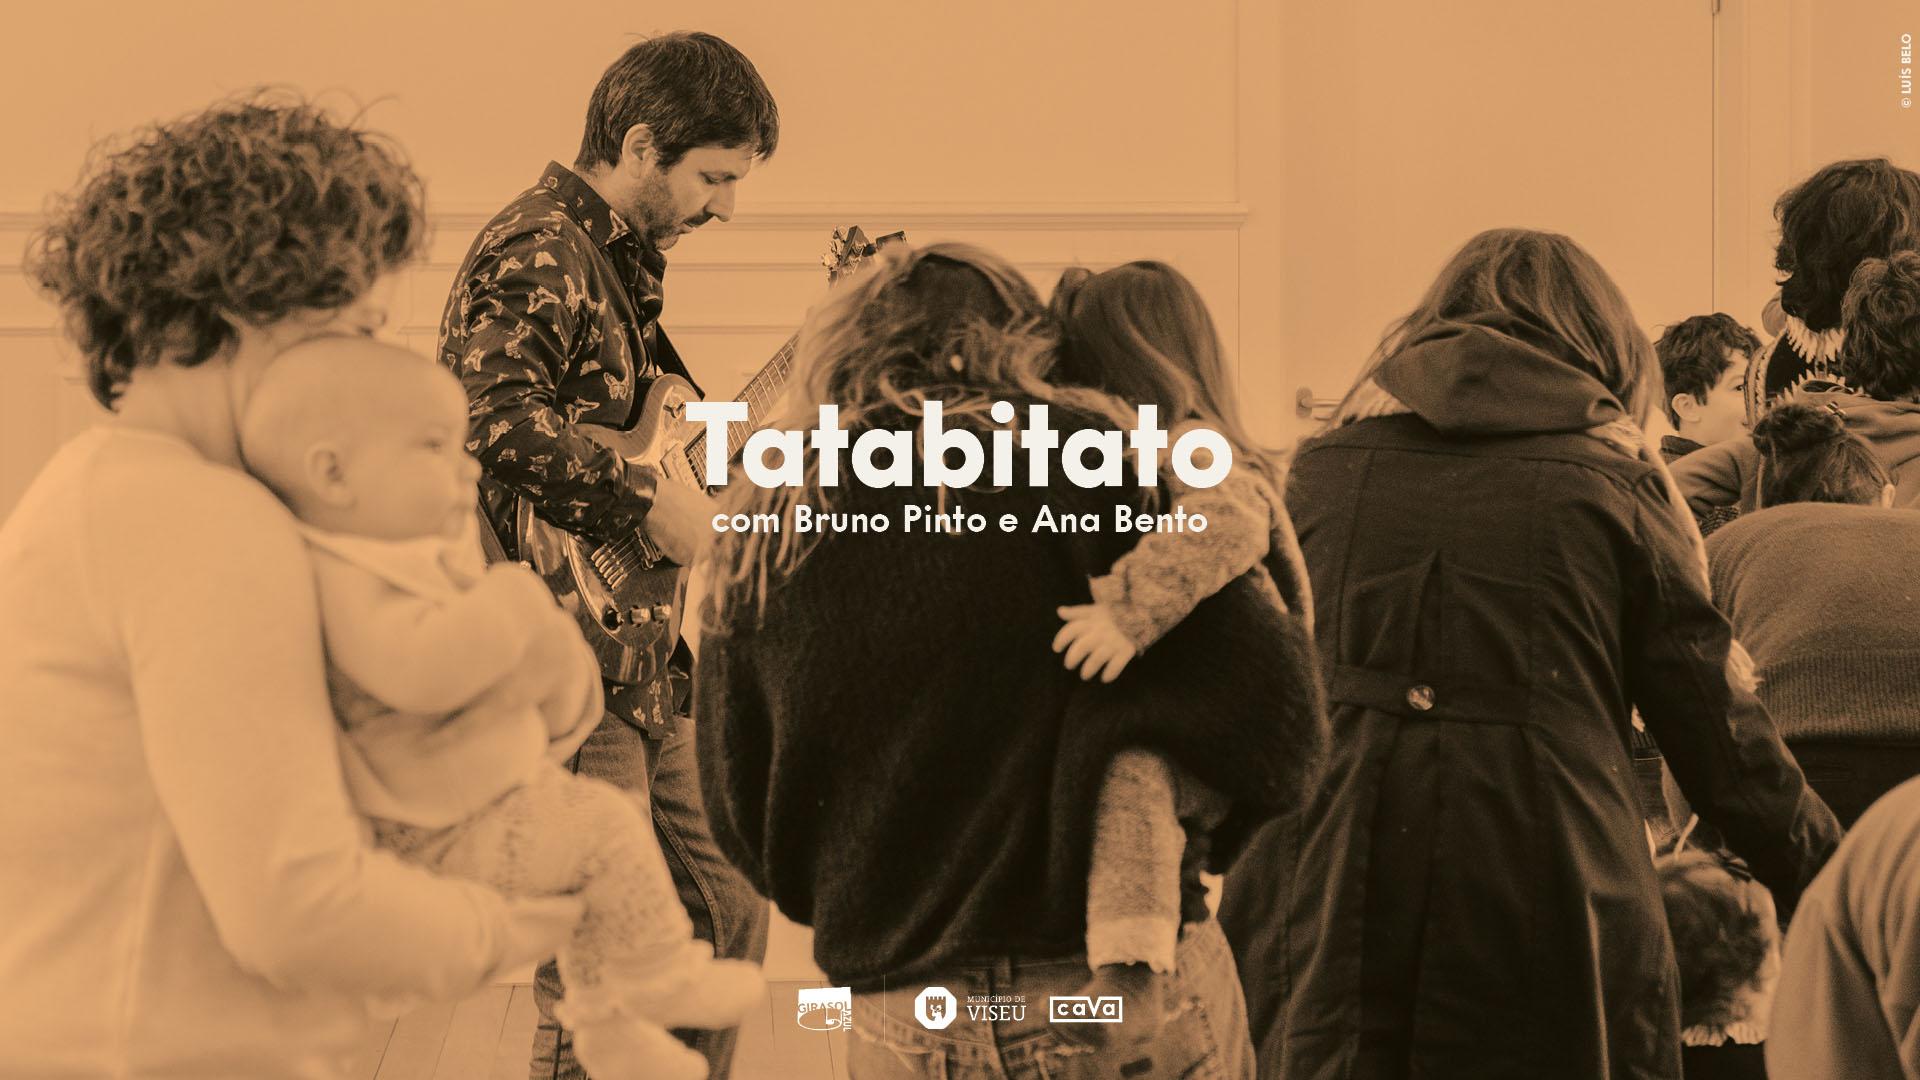 Tatabitato